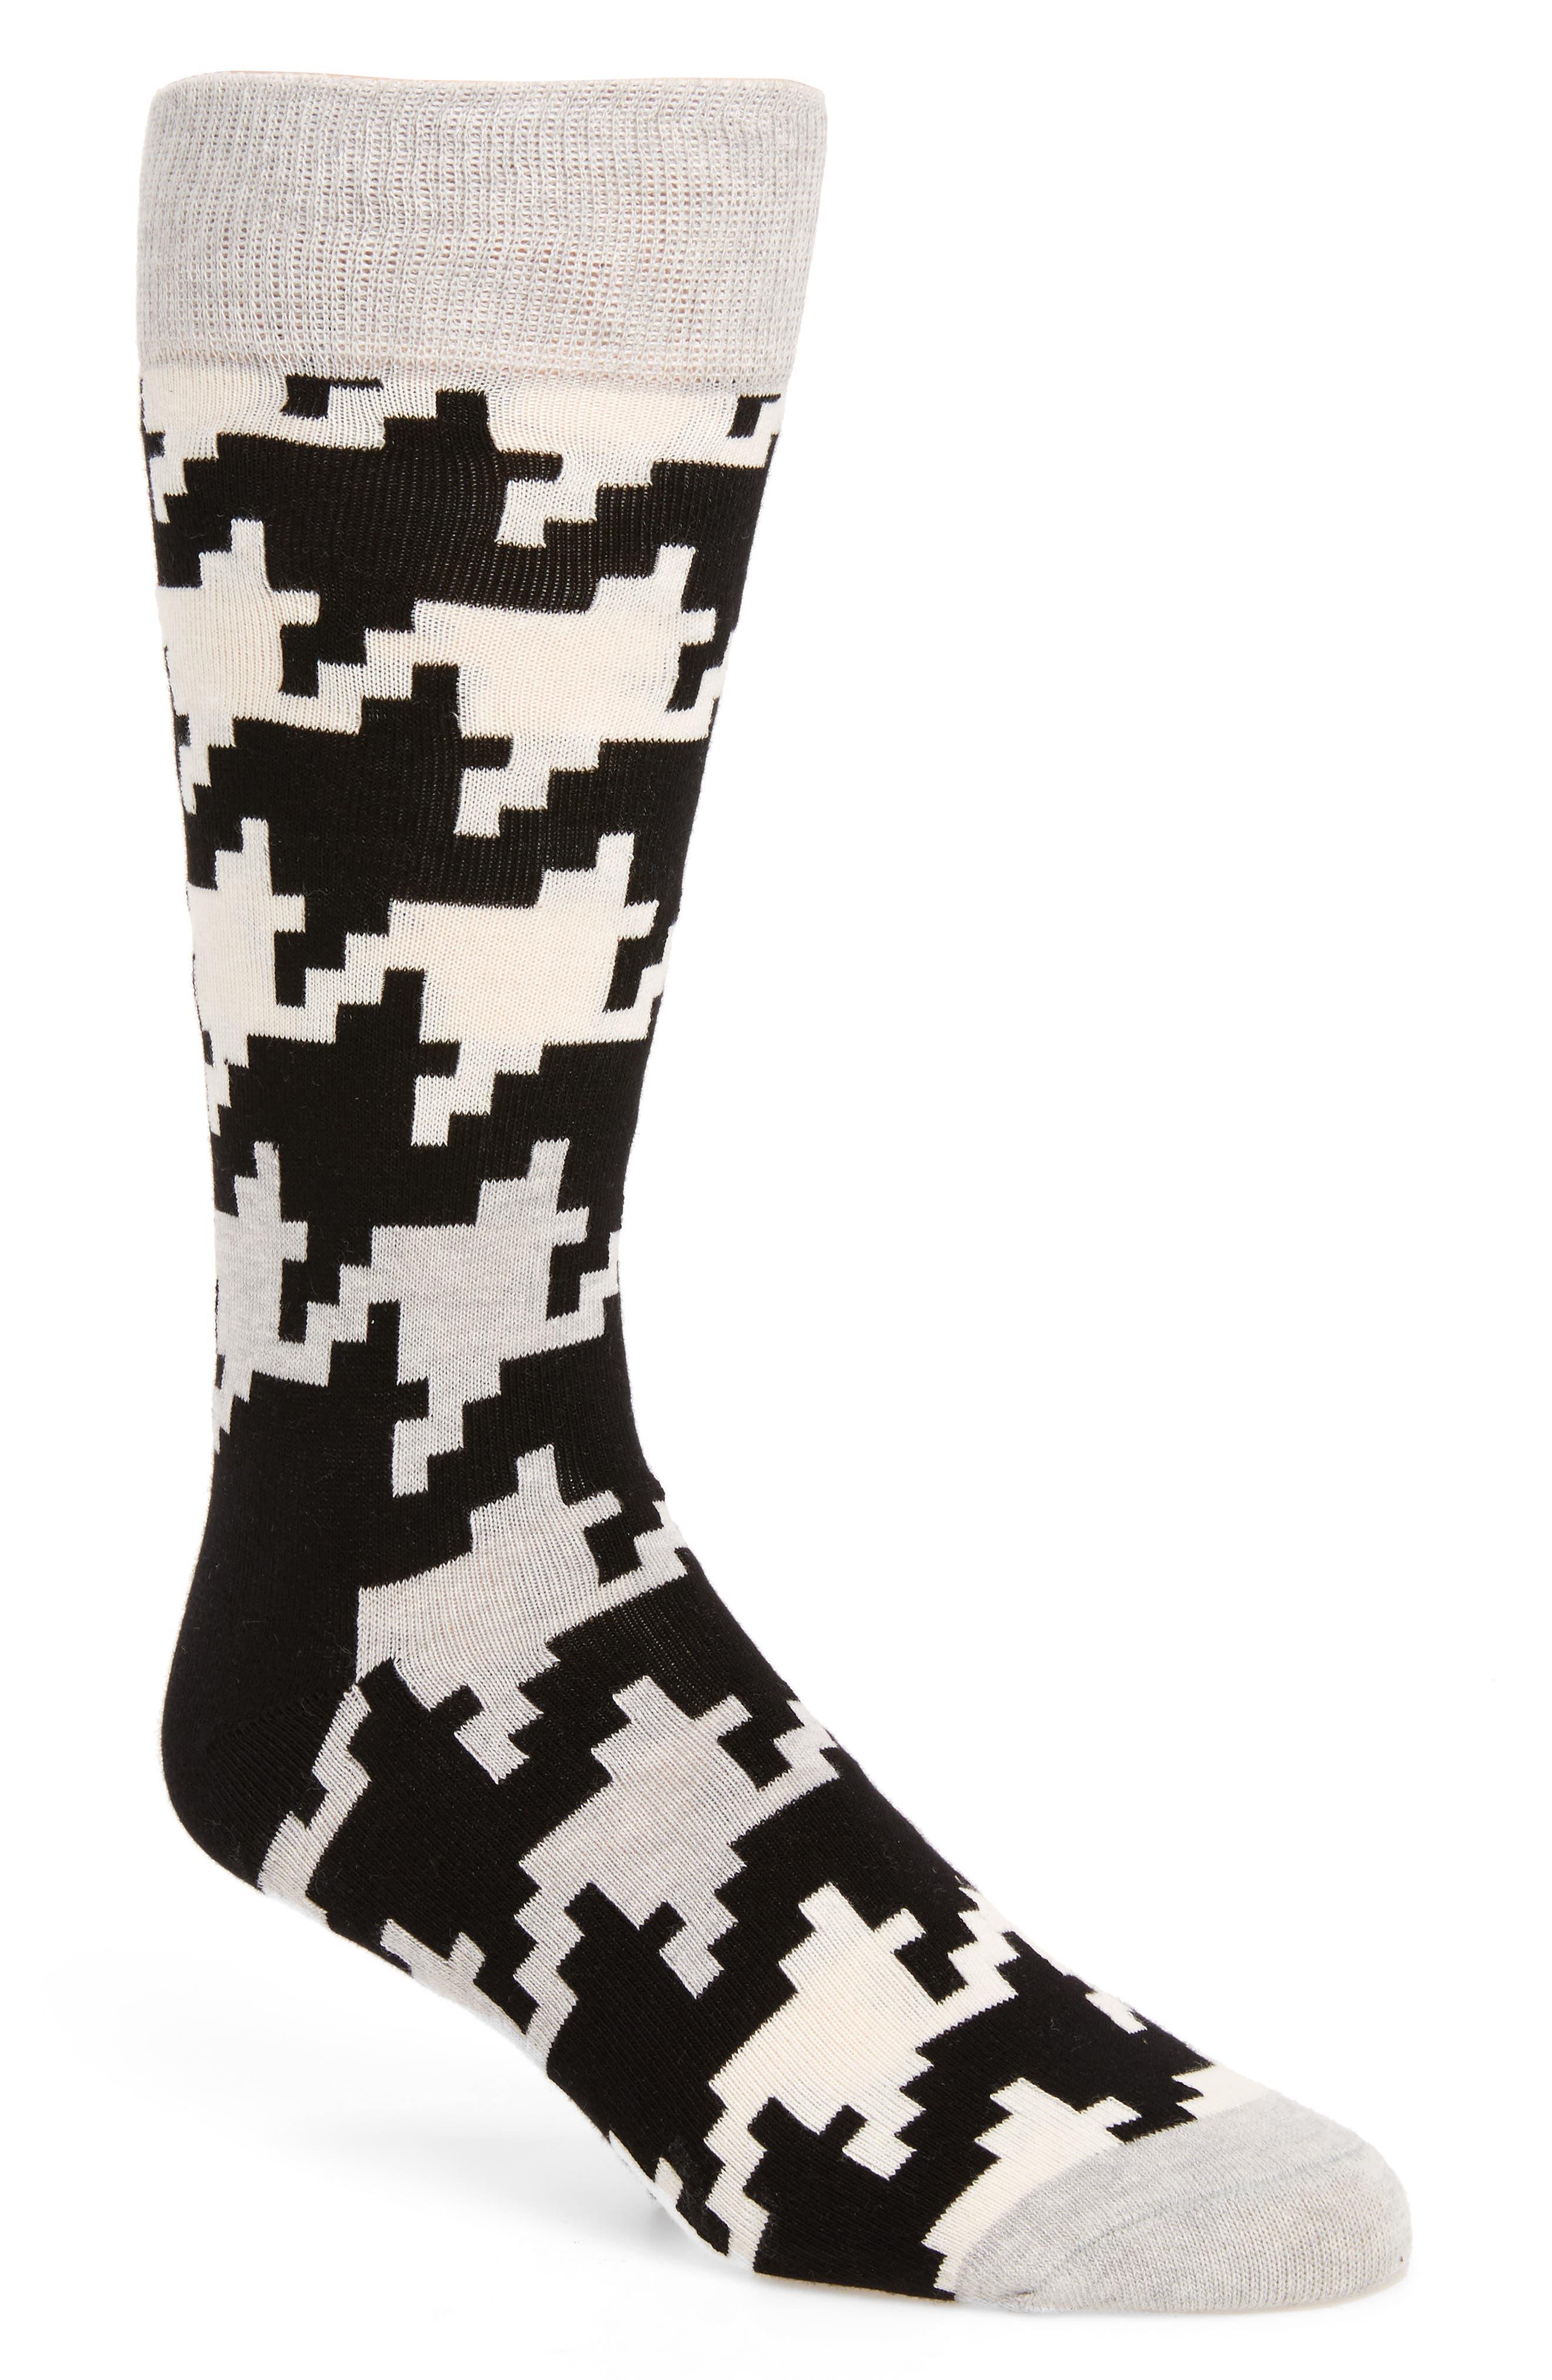 Alternate Image 1 Selected - Happy Socks Digital Houndstooth Socks